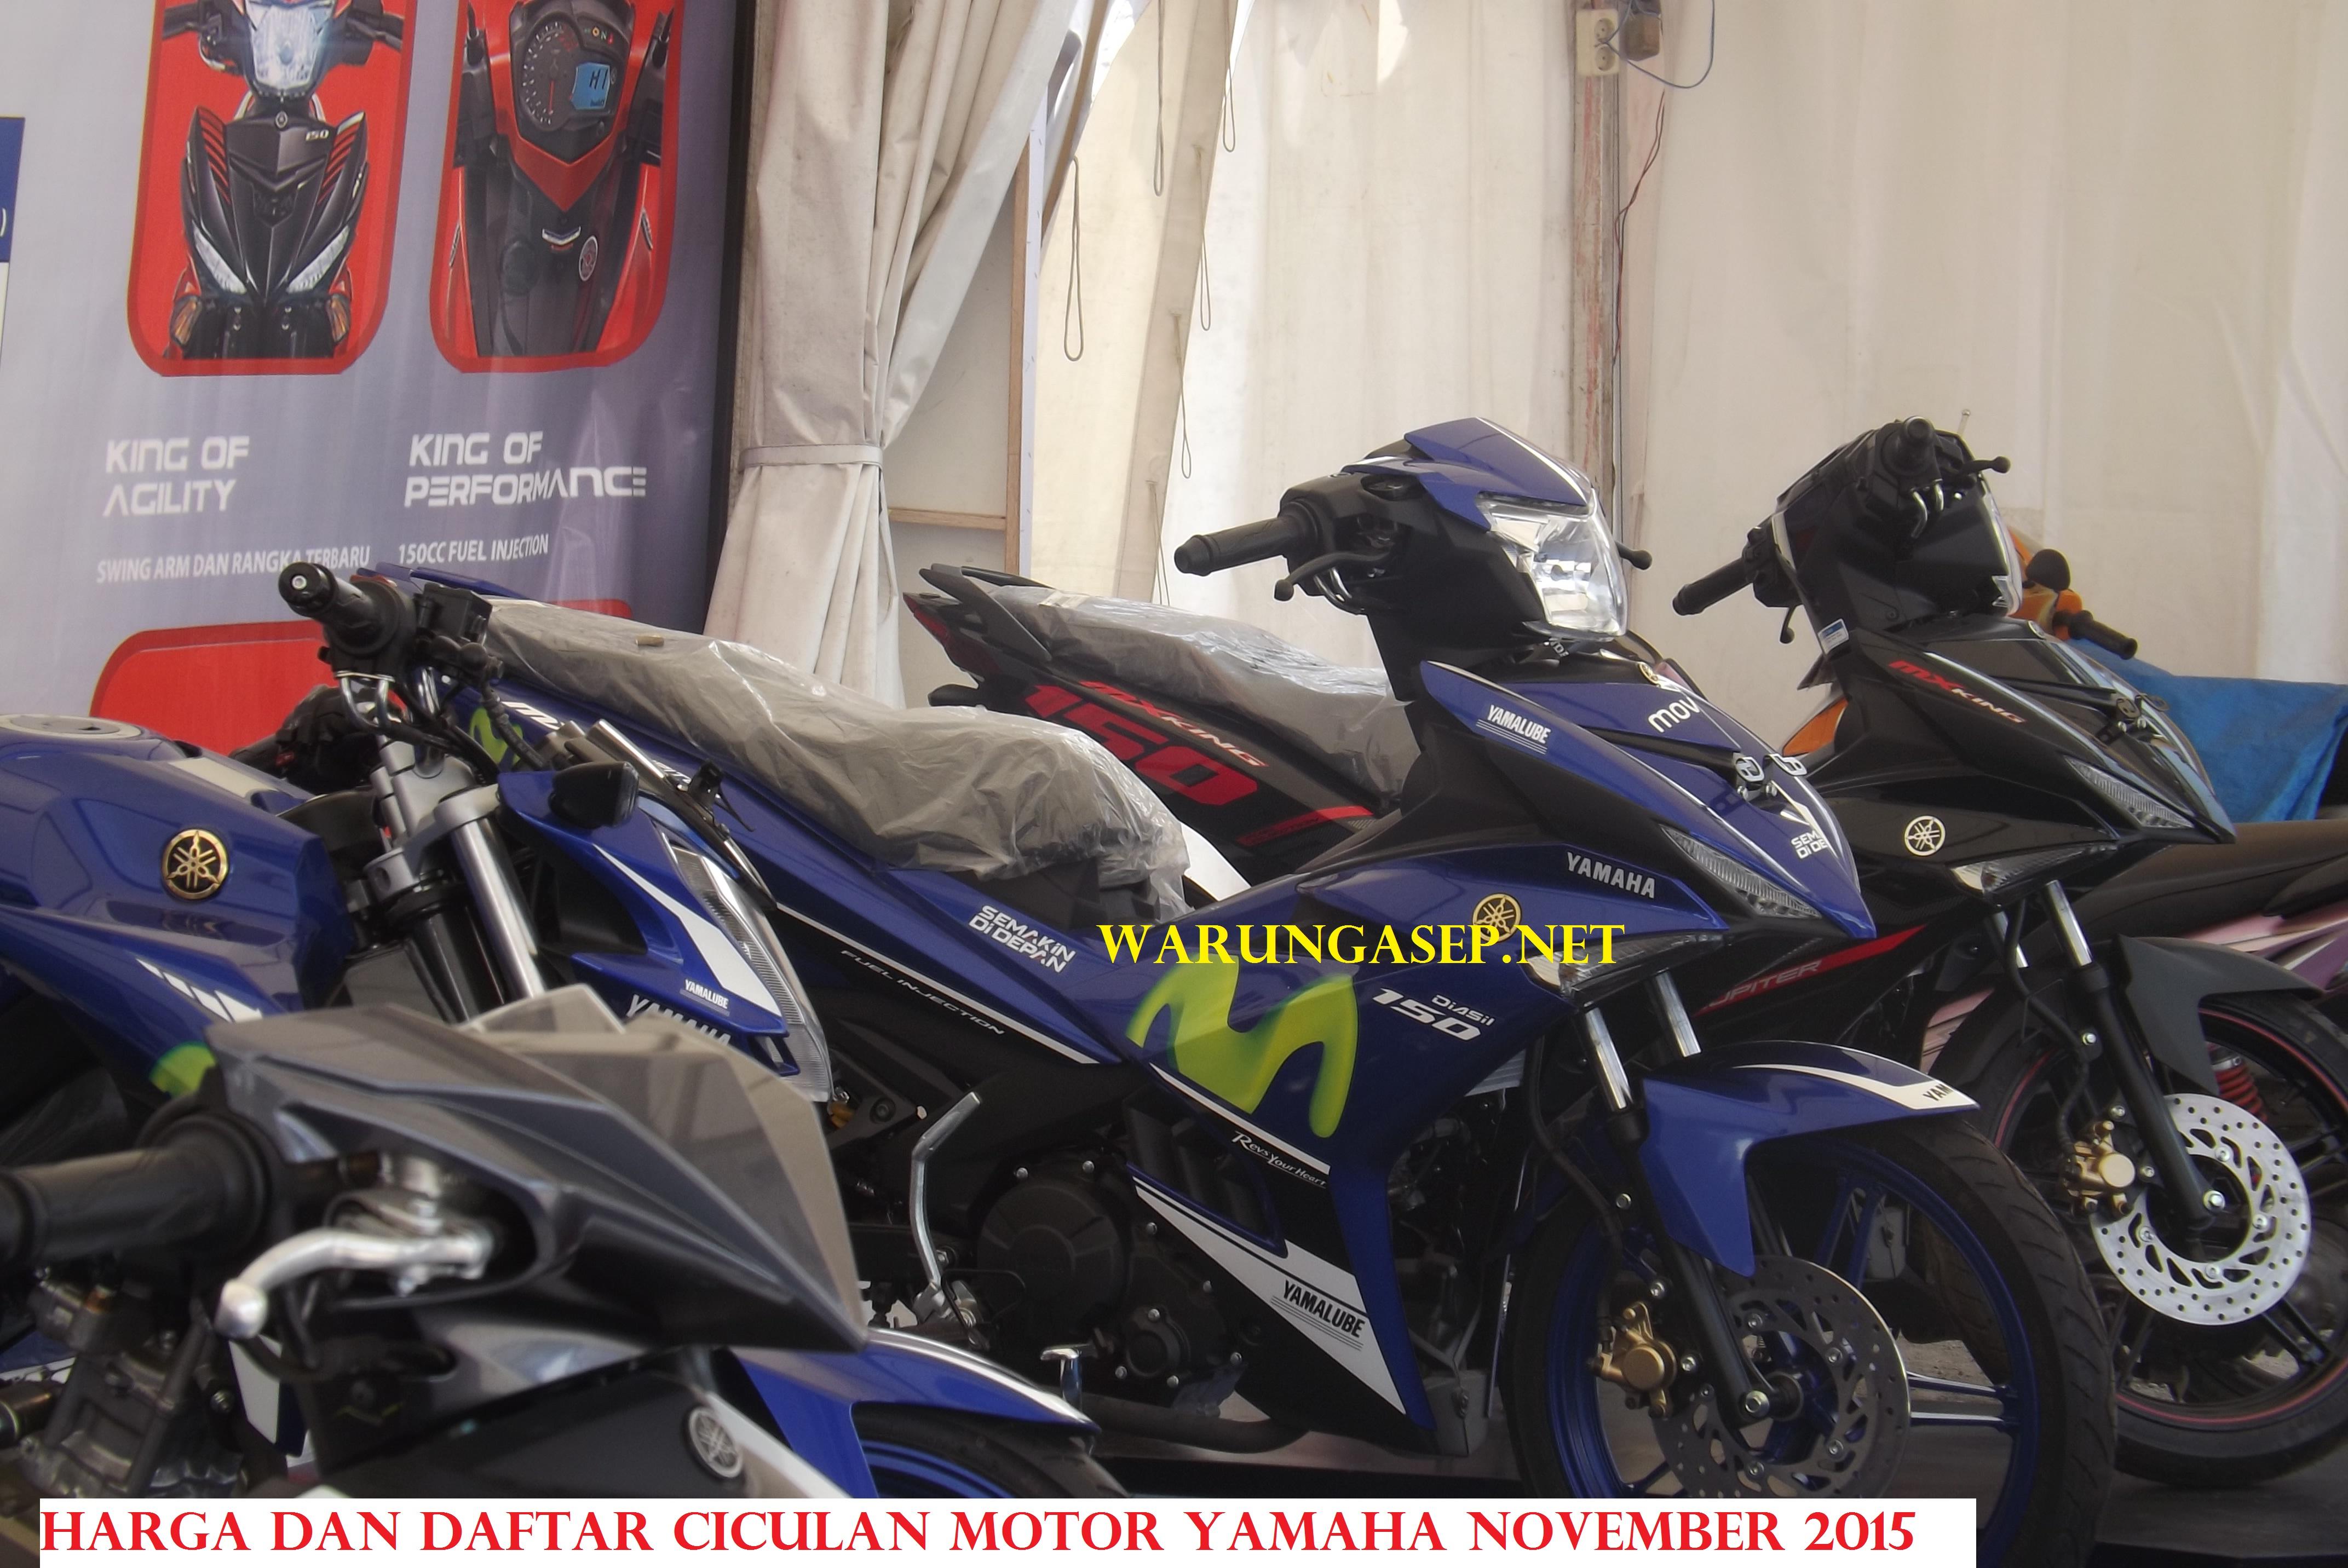 Daftar Harga Dan Cicilan Motor Yamaha Di Tasikmalaya November 2015